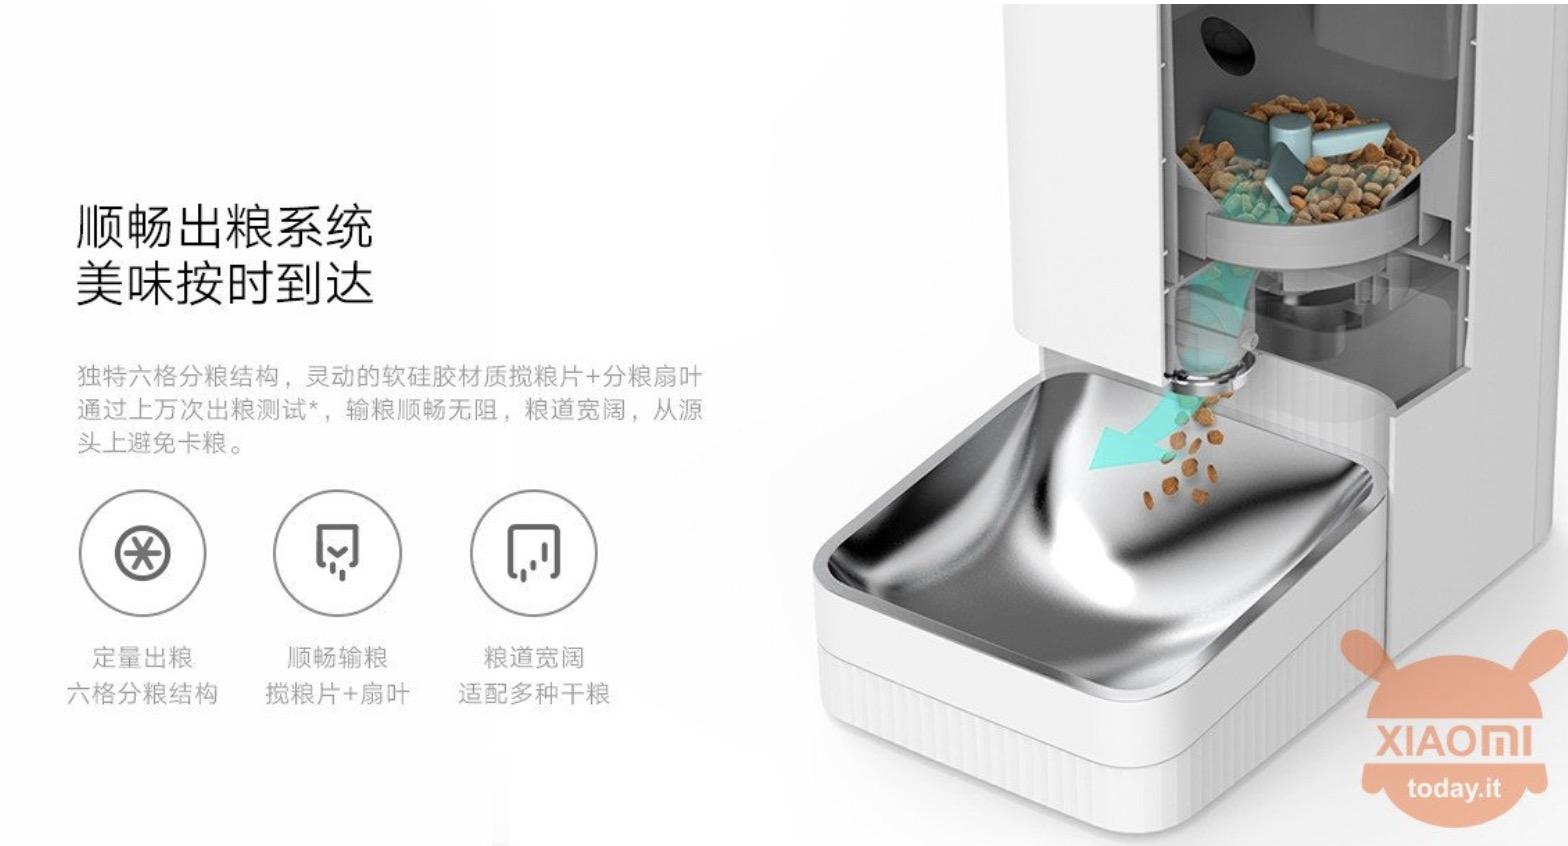 Xiaomi Mi Smart Pet Feeder